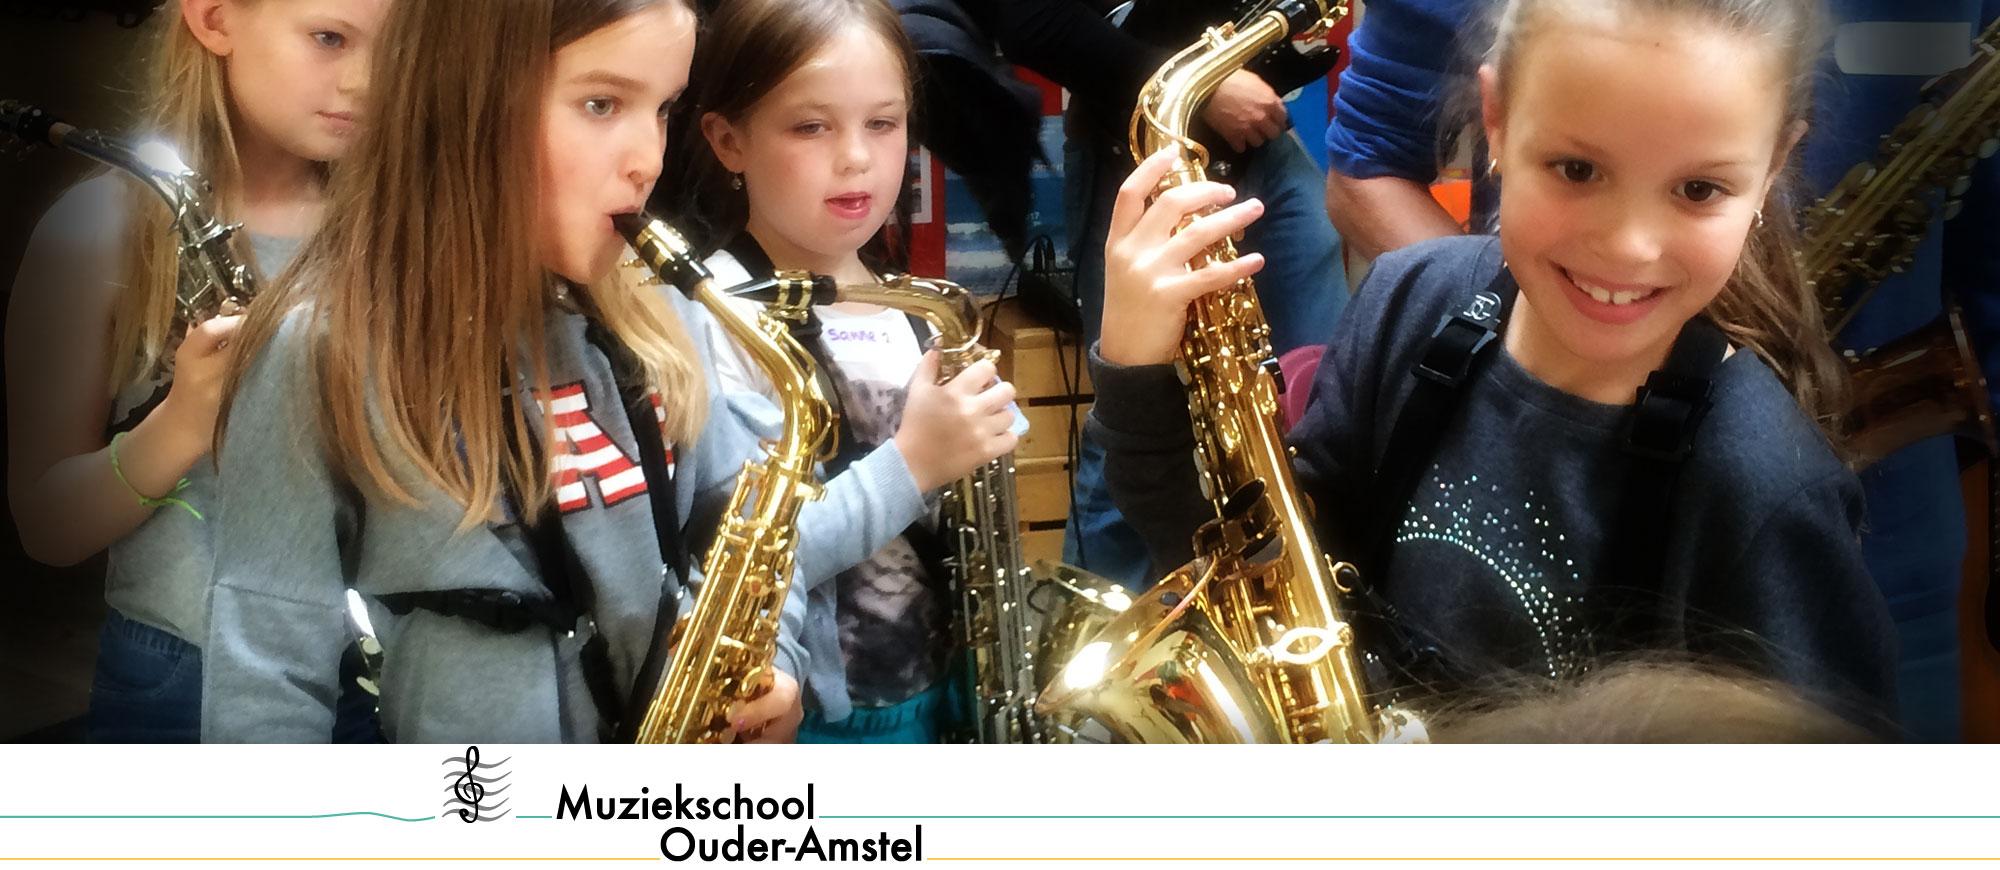 Muziekschool Ouder-Amstel